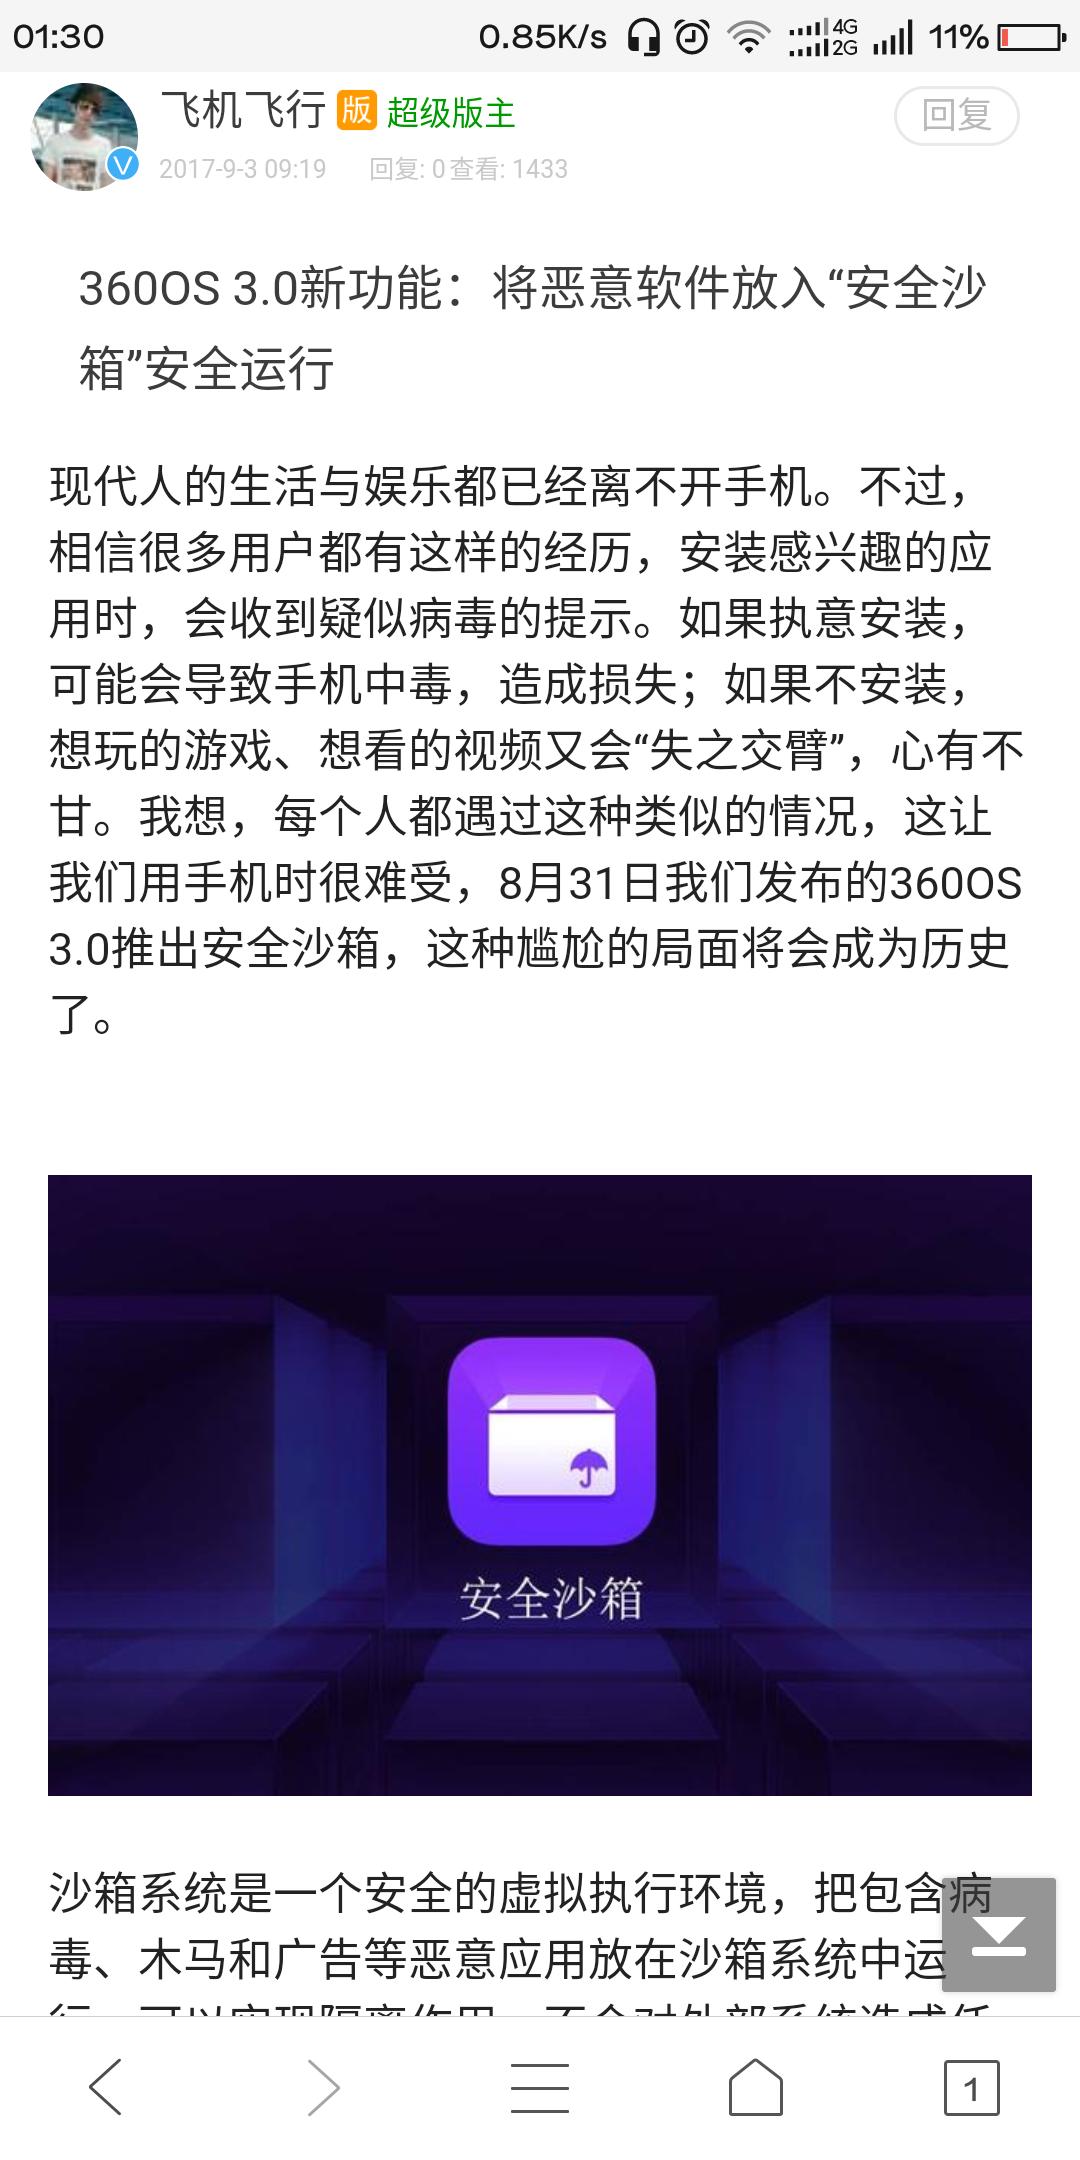 Screenshot_2018-08-11-01-30-34.png